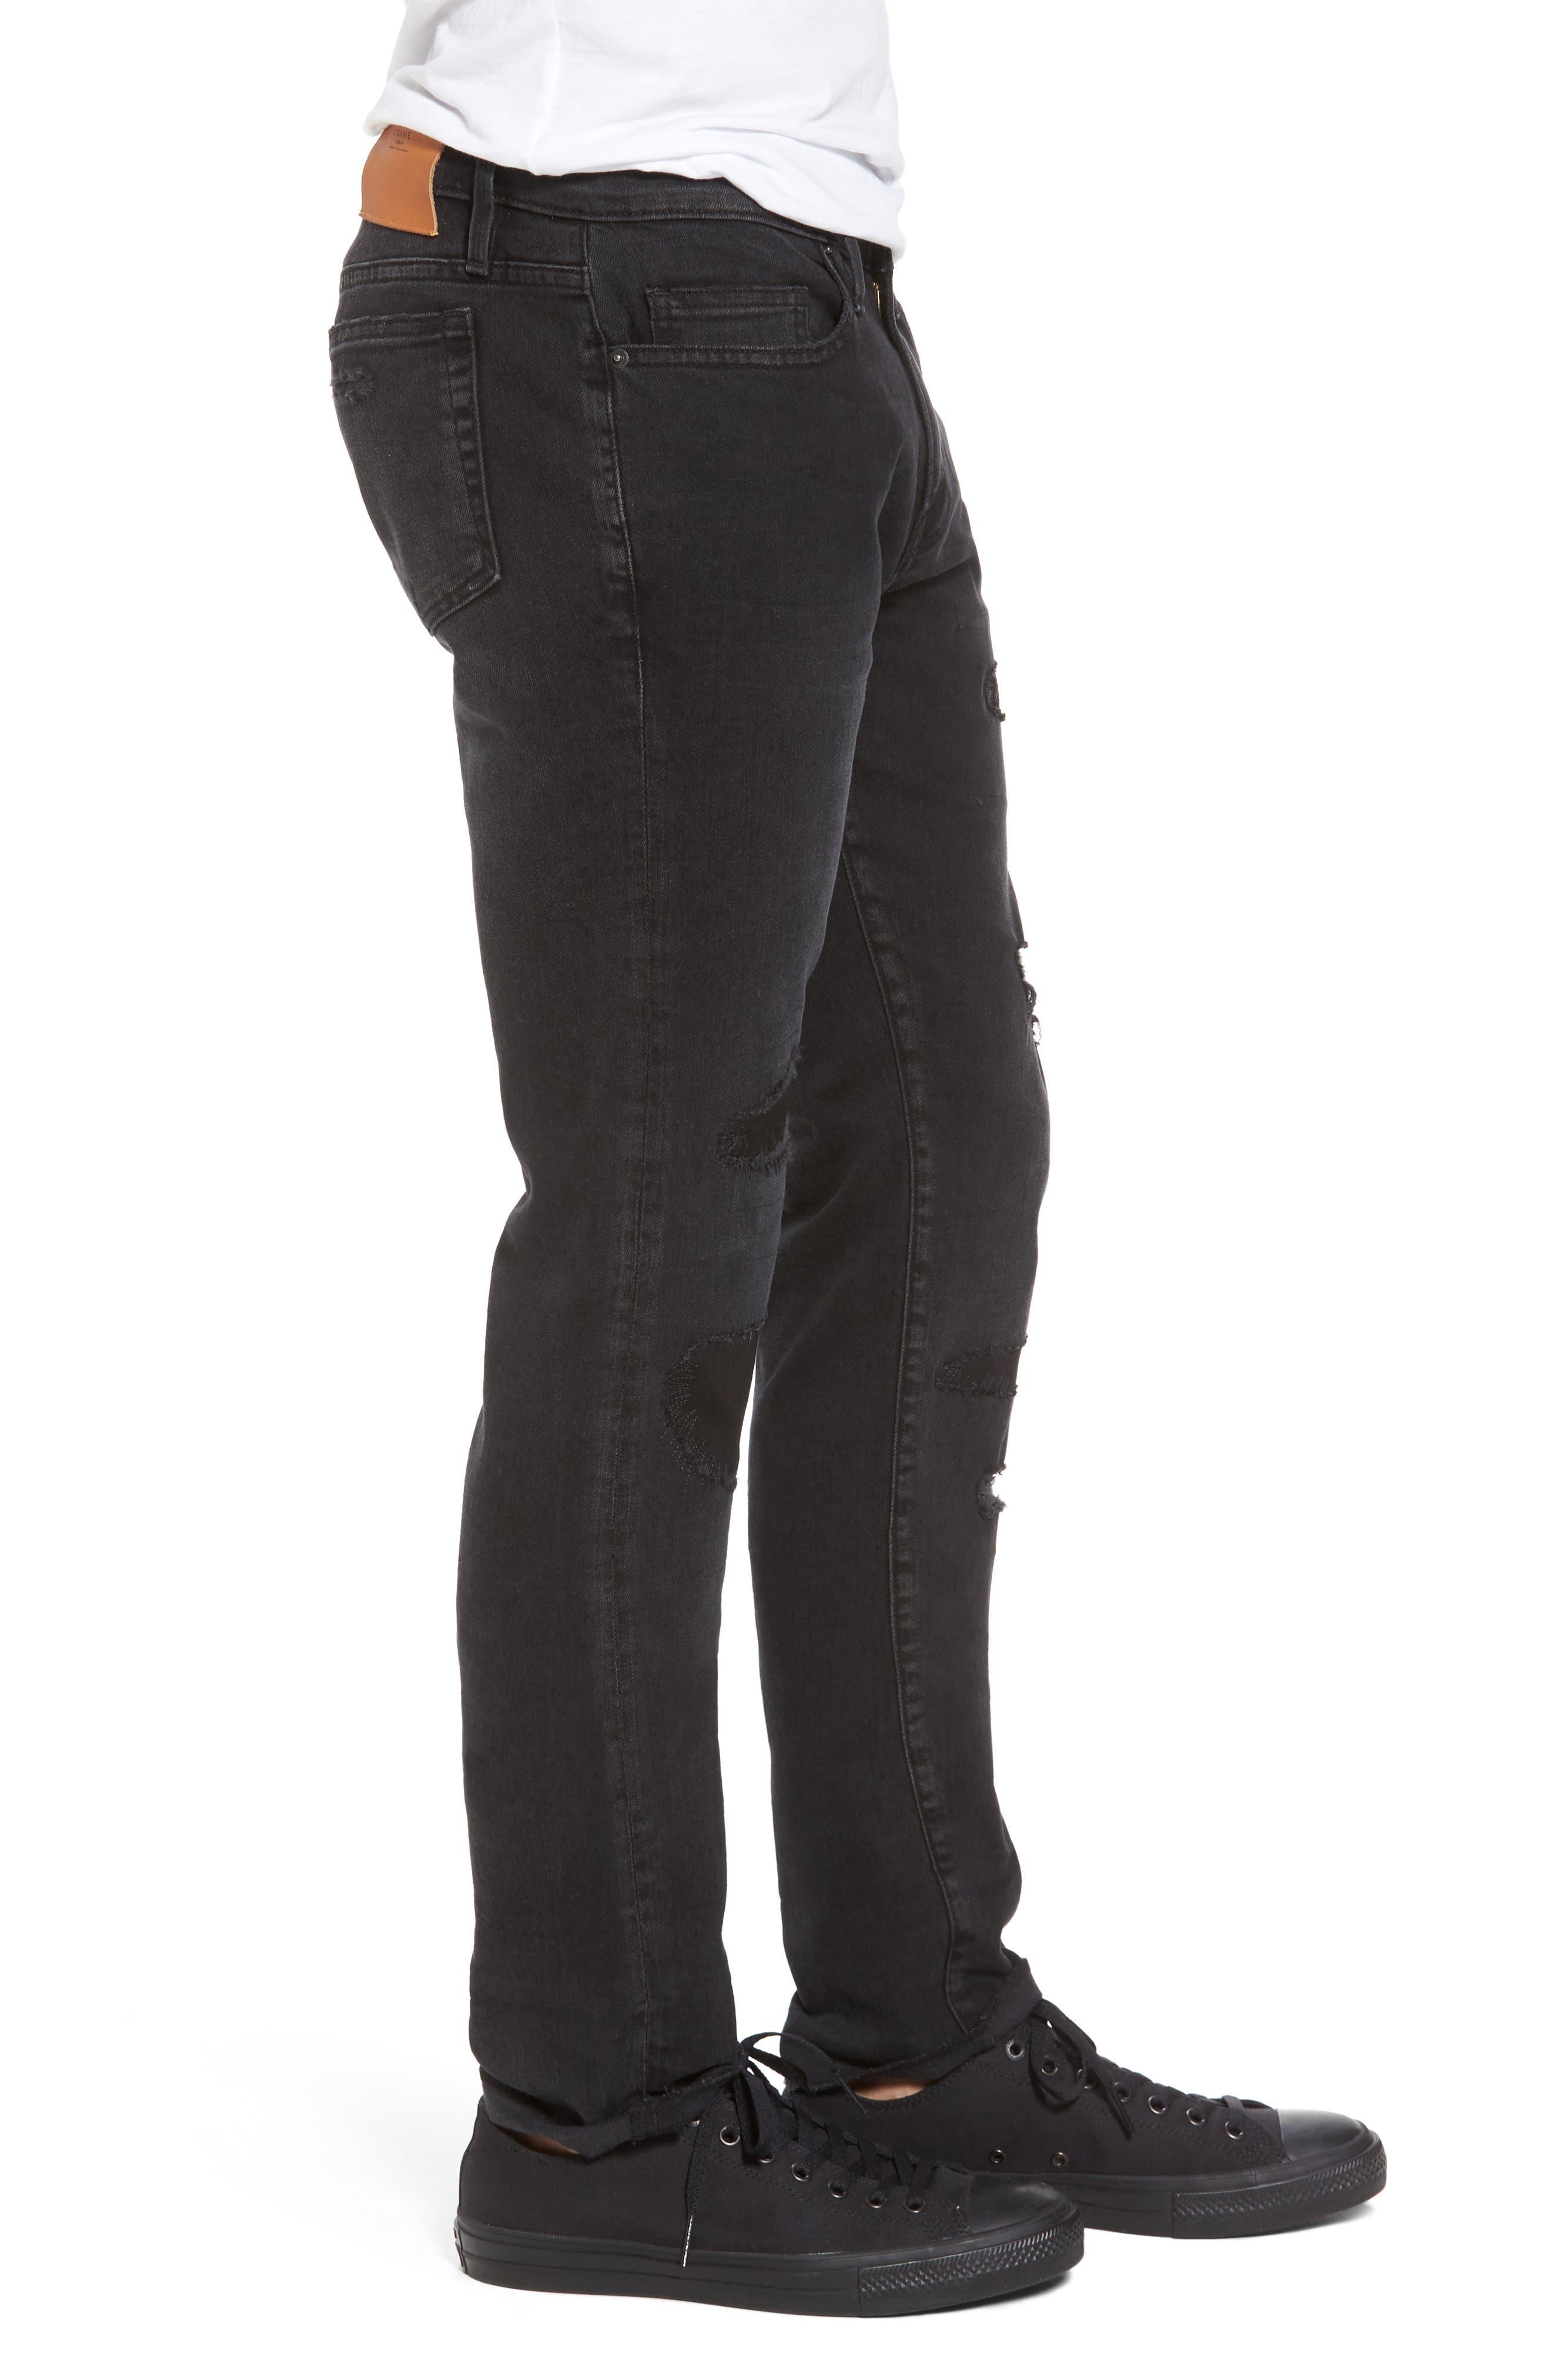 L'Homme Skinny Fit Jeans,                             Alternate thumbnail 3, color,                             001